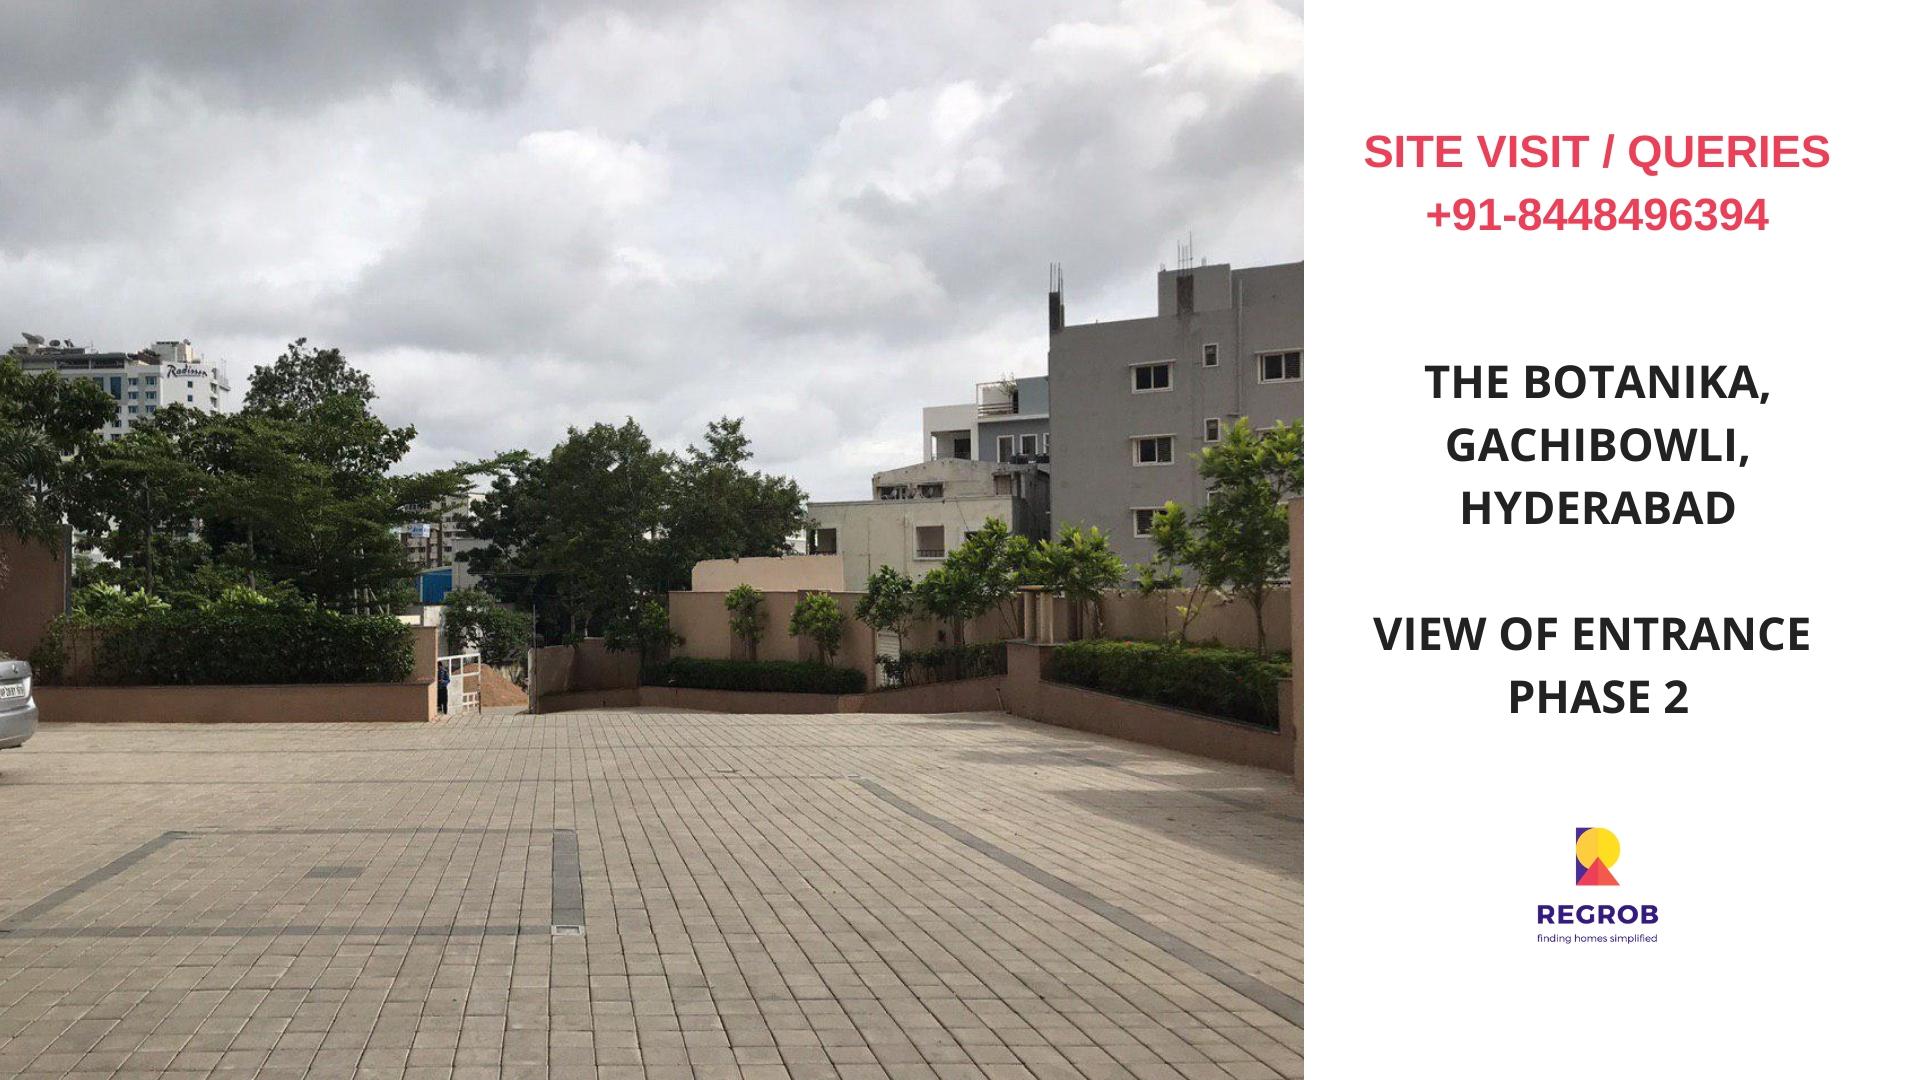 The Botanika Gachibowli Hyderabad